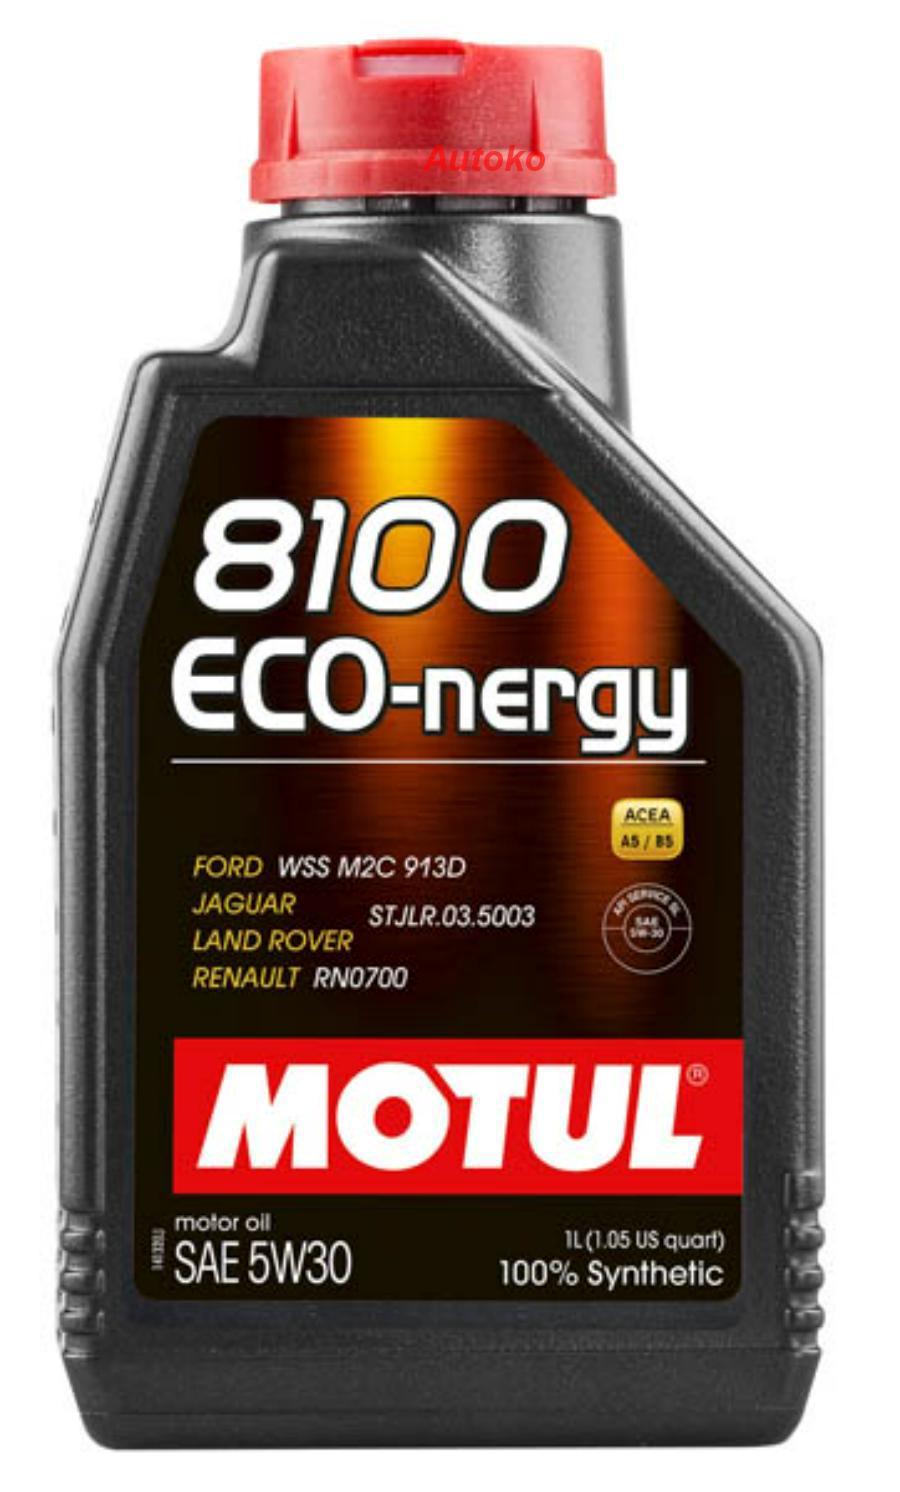 Масло моторное синтетическое 8100 ECO-NERGY 5W-30, 1л